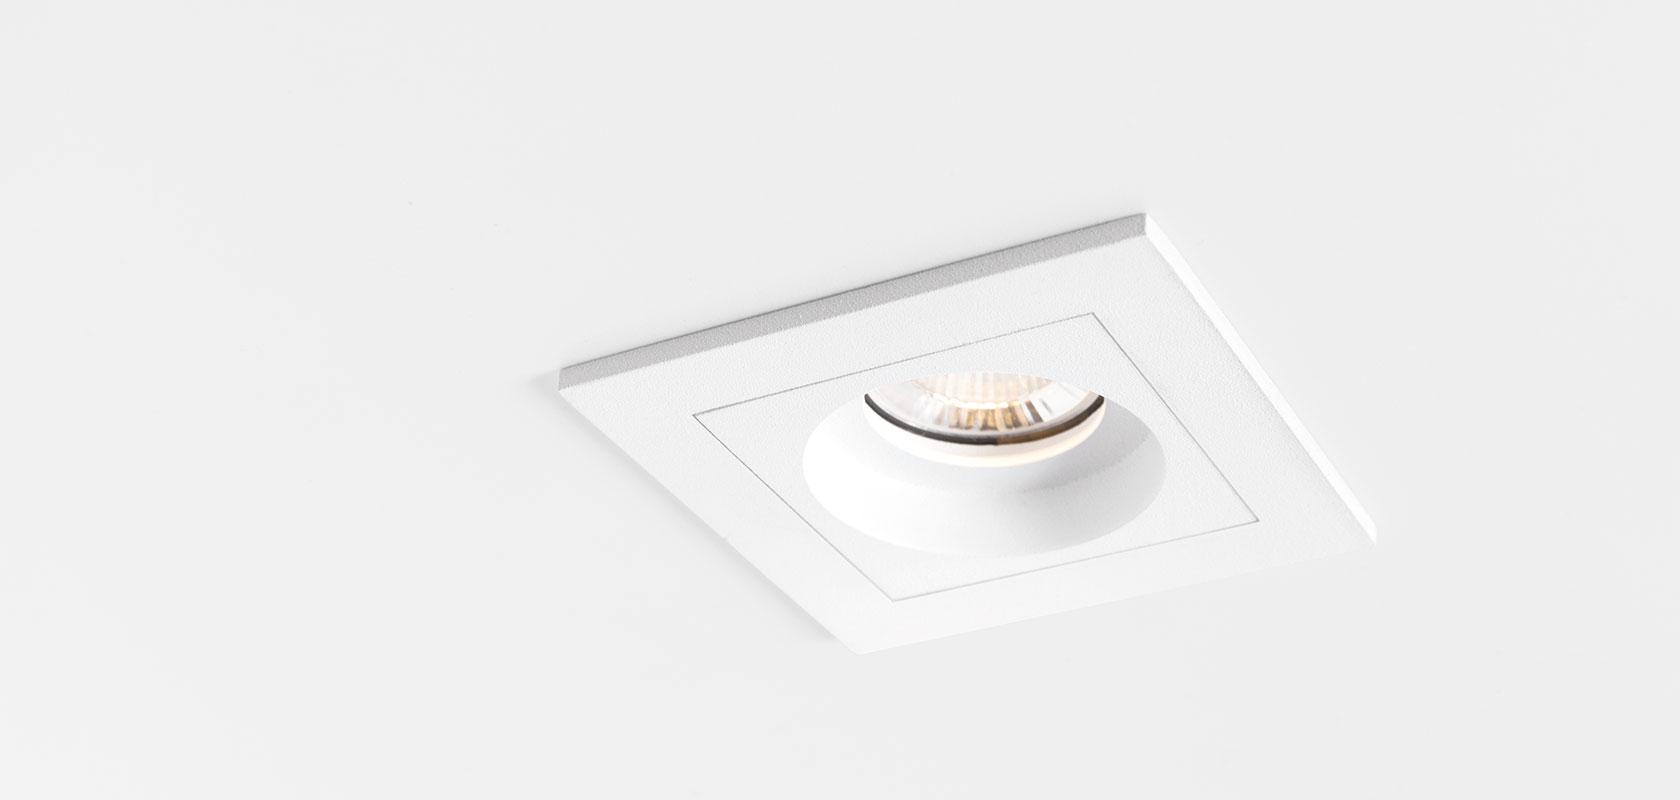 Qbini round in LED 2700K, 40°, 3/4,3W, 302/402lm, 350/500mA, CRI92, IP54, valge moodul ilma raamita